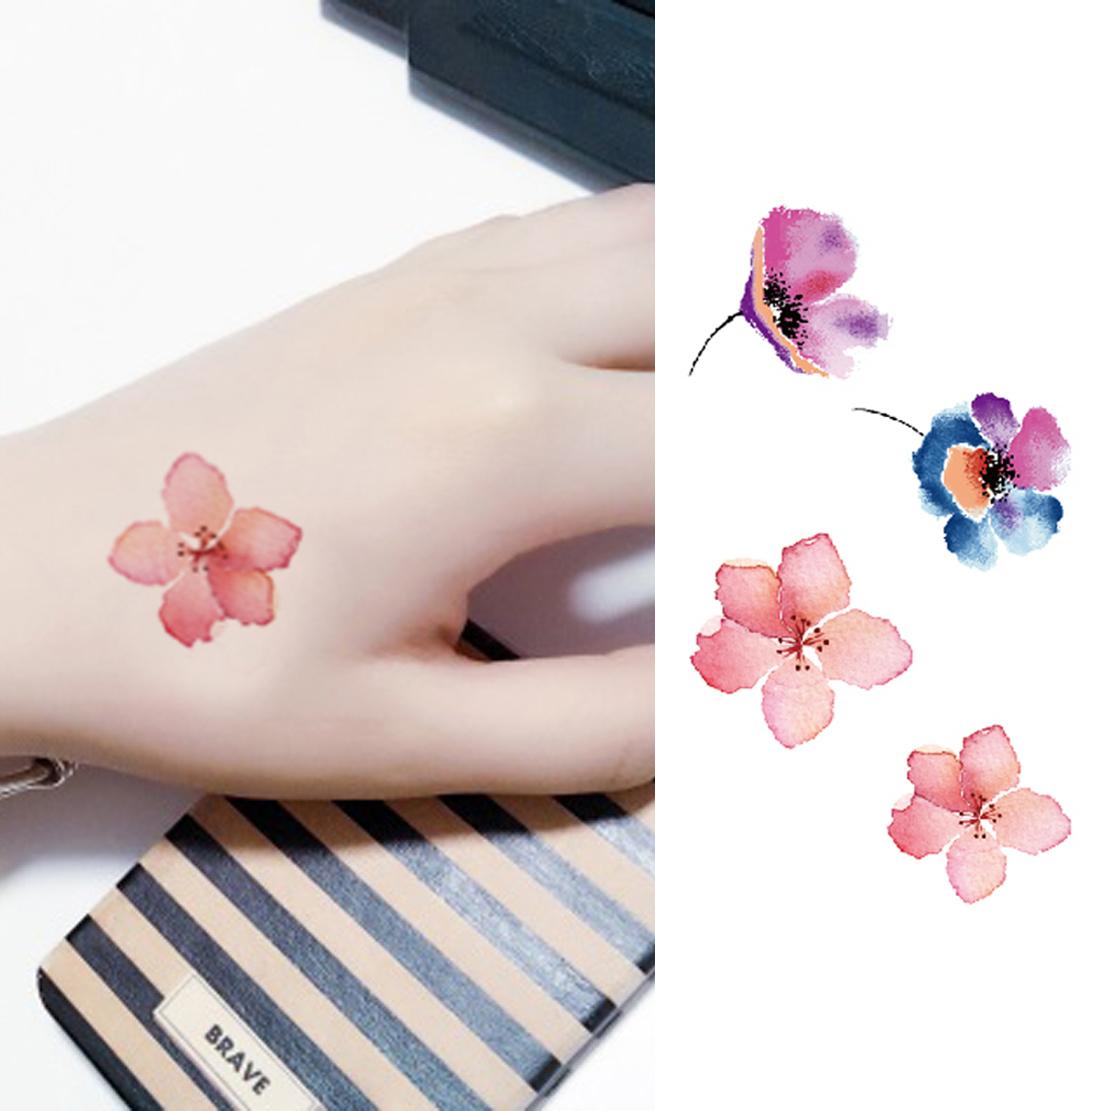 Usd 408 Hand Painted Peach Pattern Body Stickers Waterproof Female